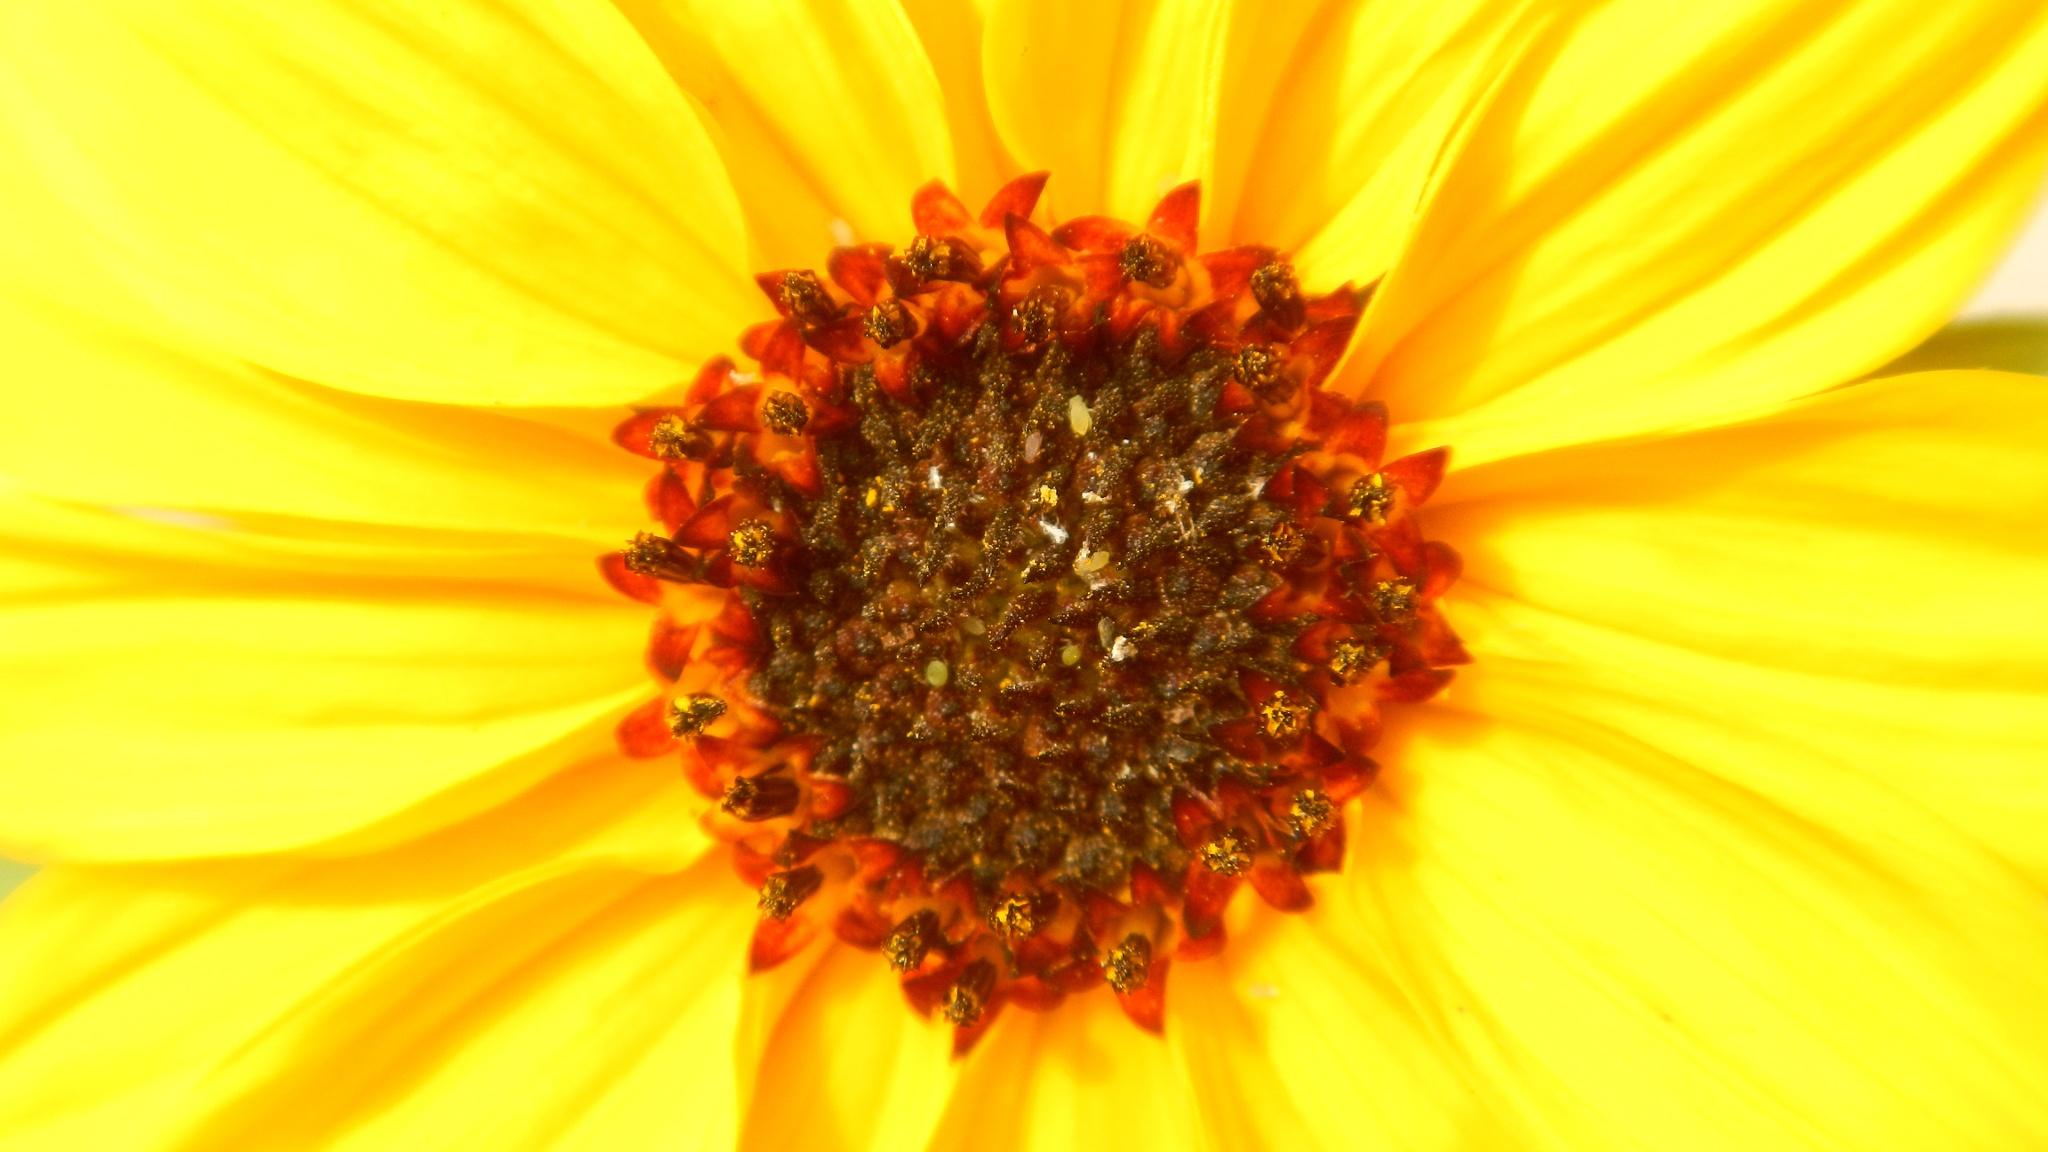 I am yellow by अनूप यादव (pixelzz)